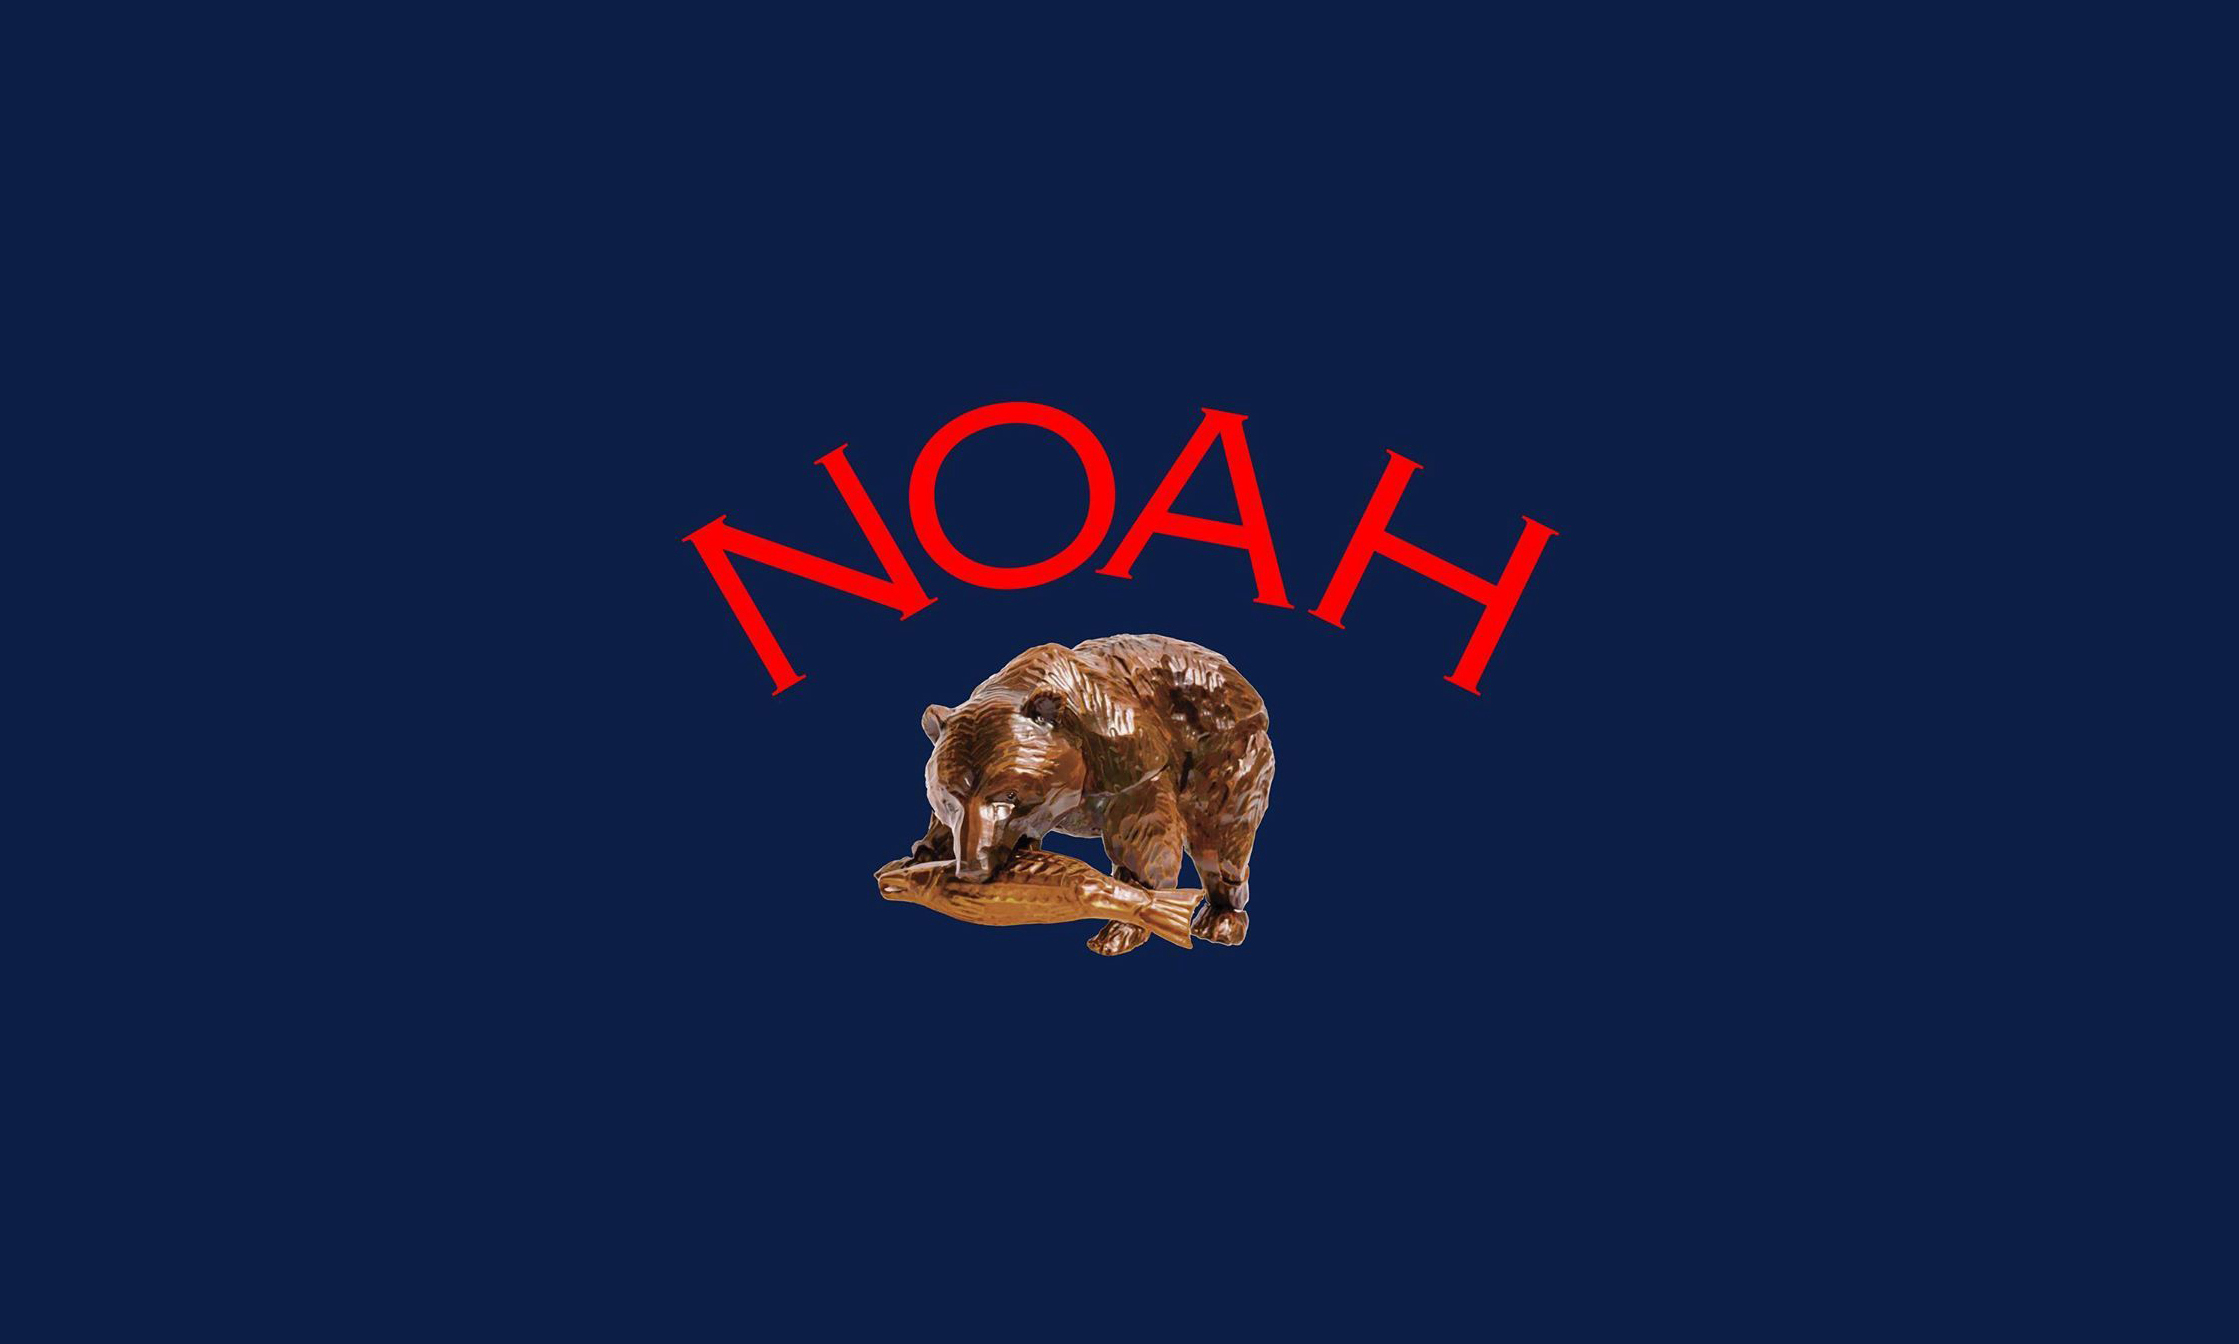 NOAH 开设日本地区第二家线下门店